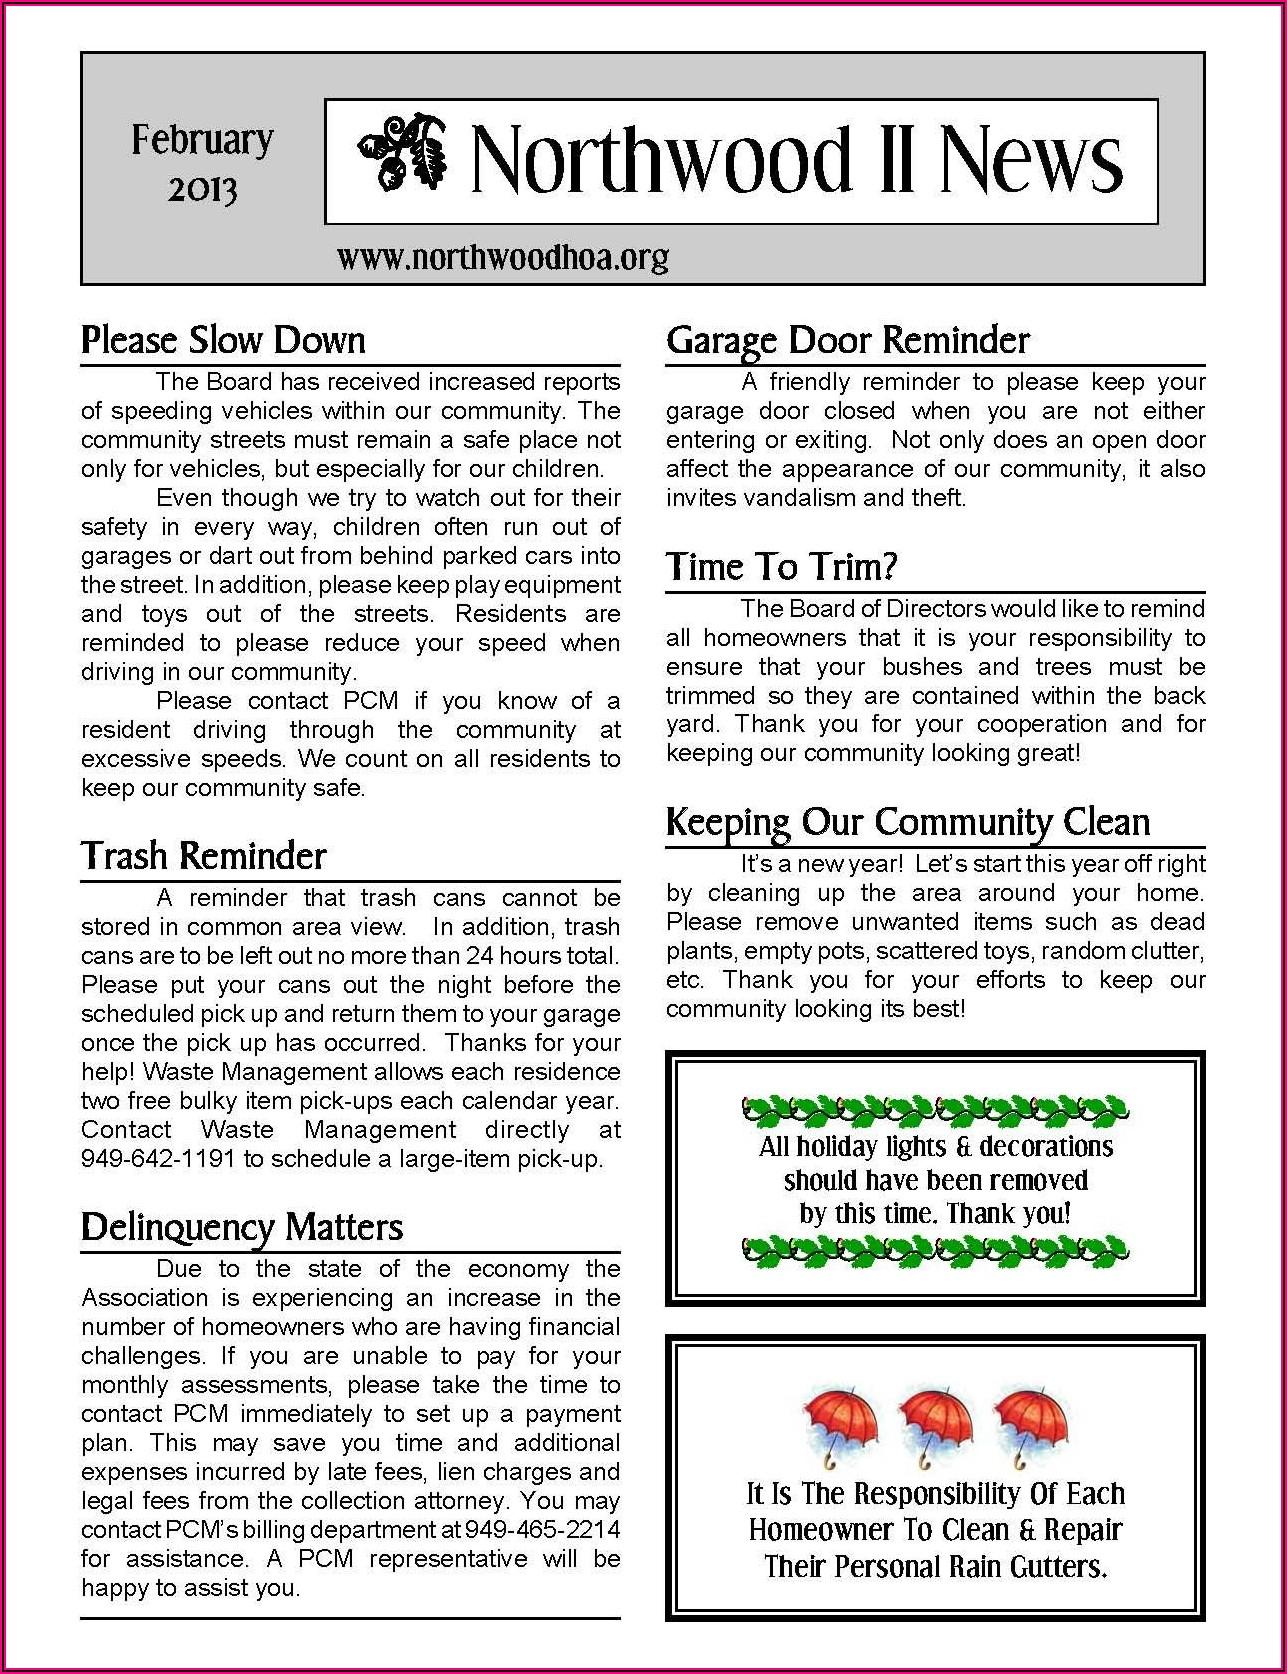 Homeowners Association Neighborhood Newsletter Templates